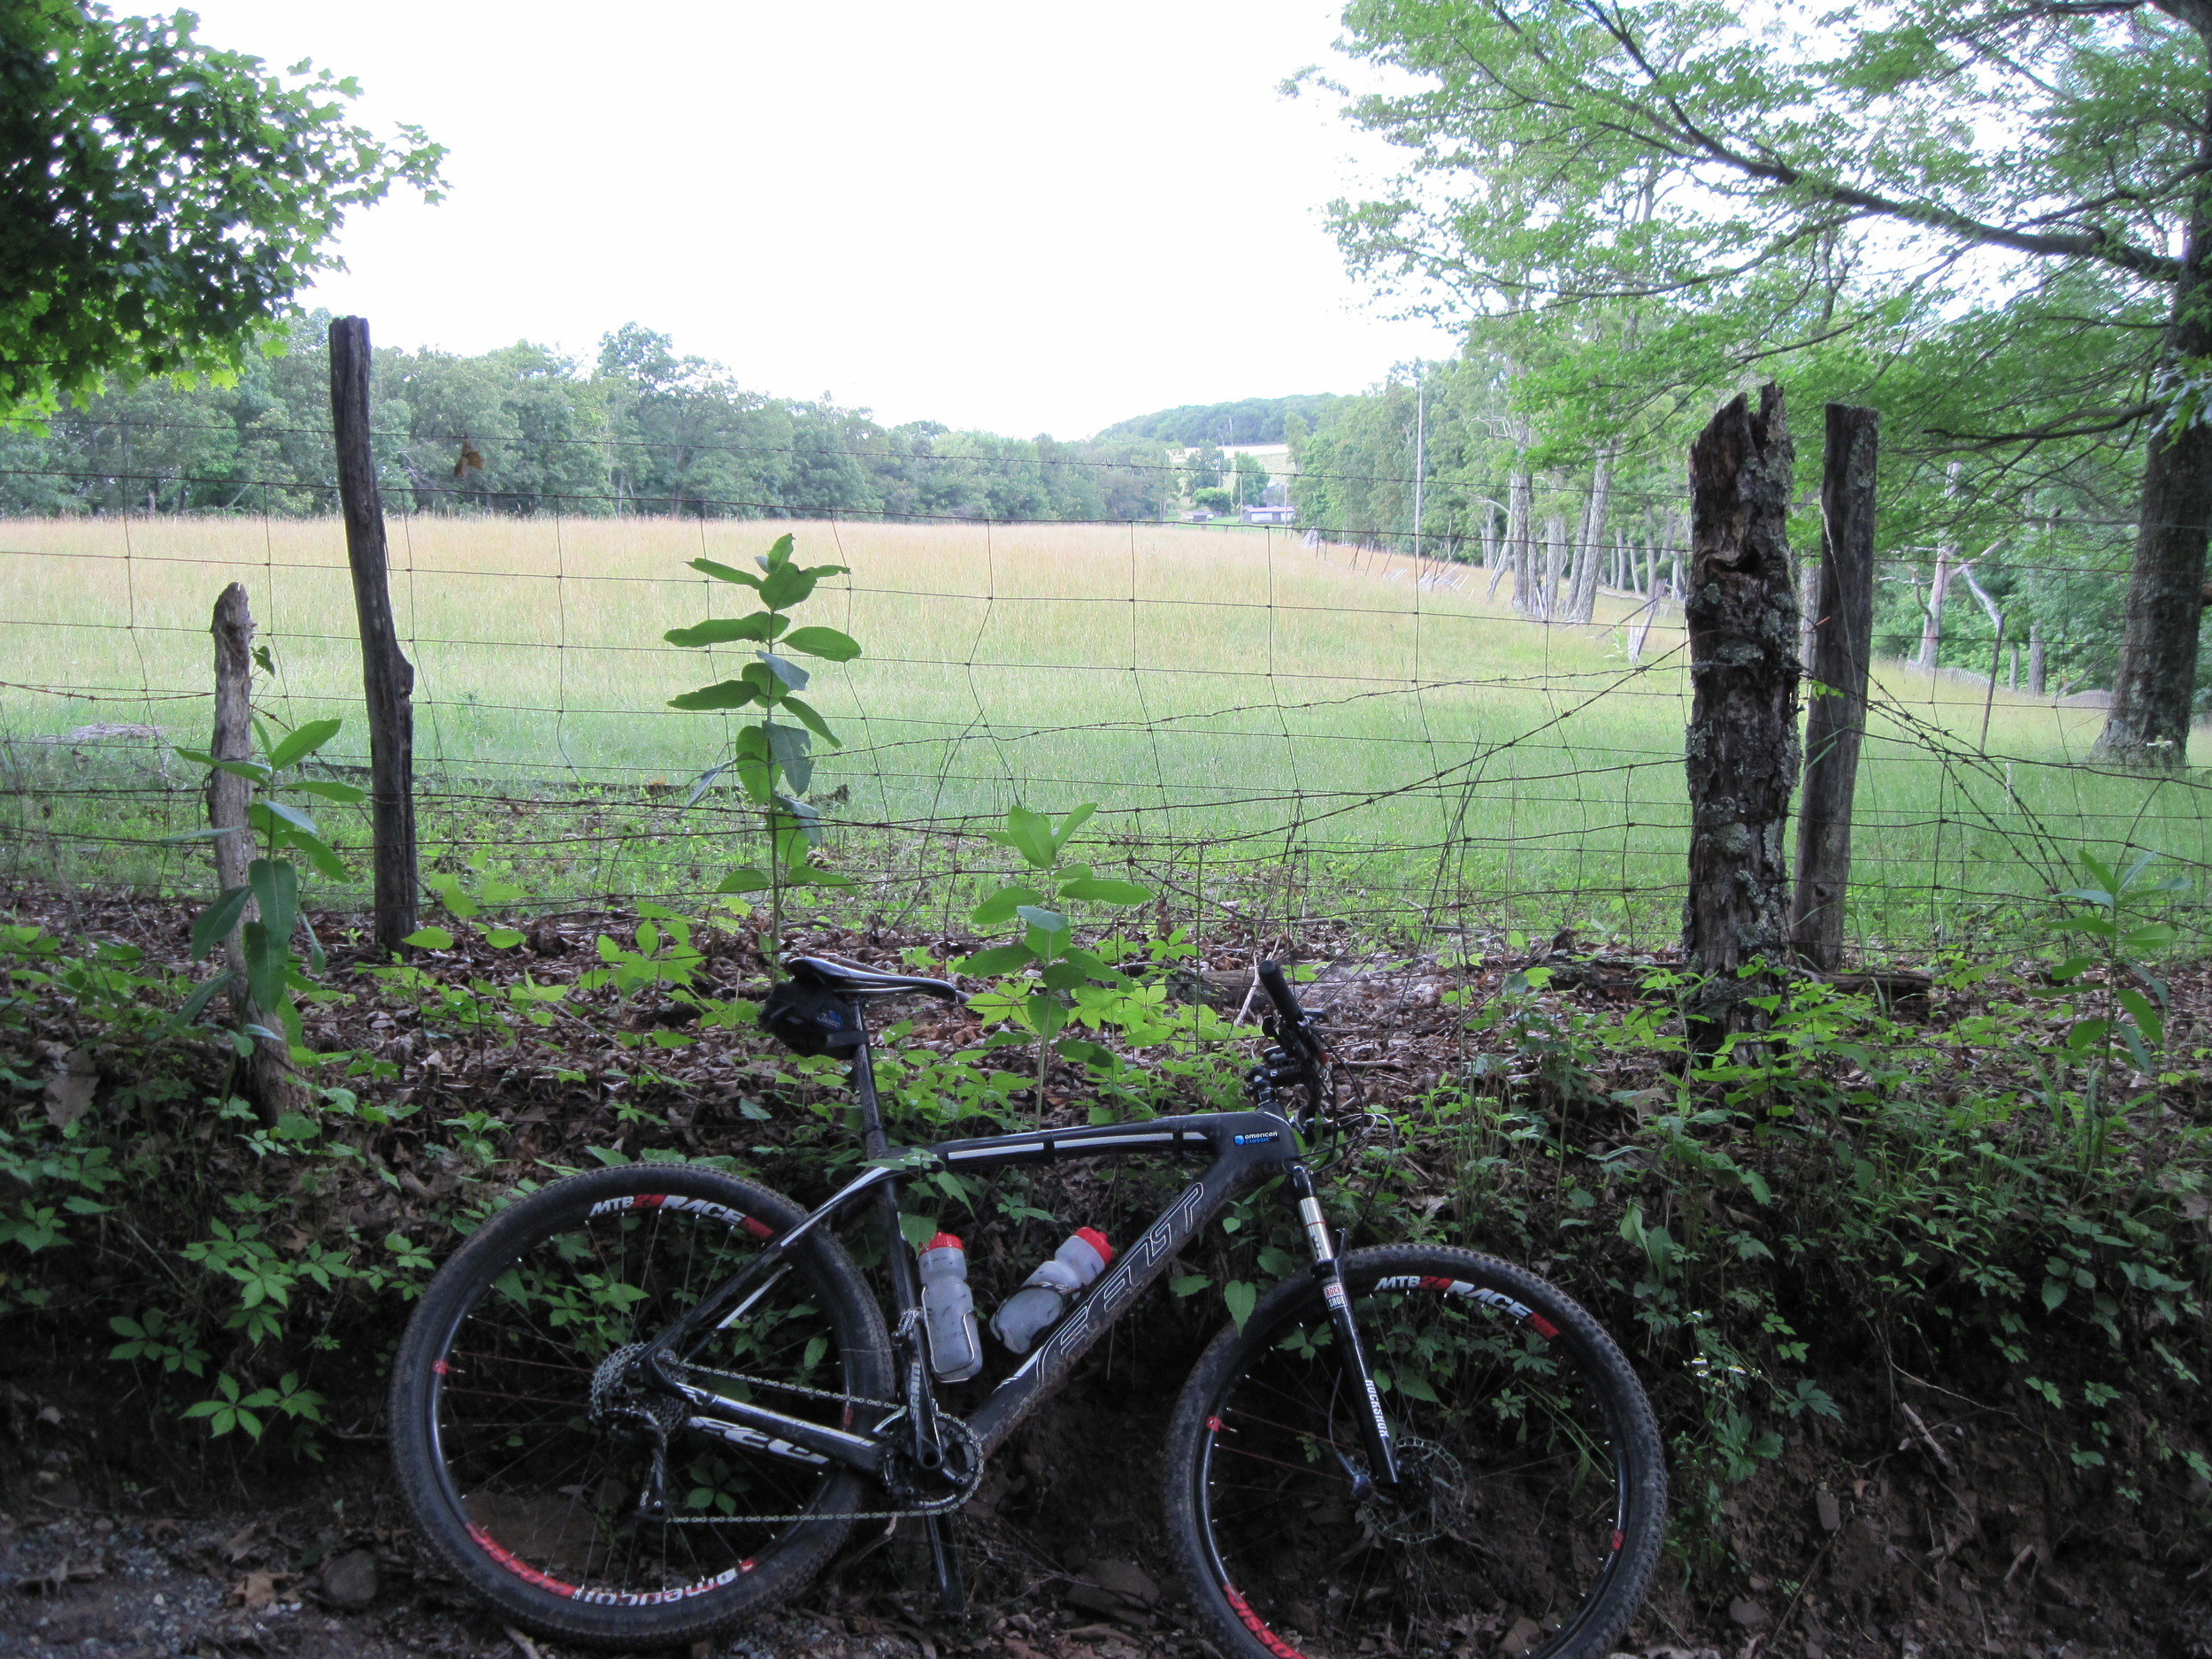 Ridgetop Field and the Bike